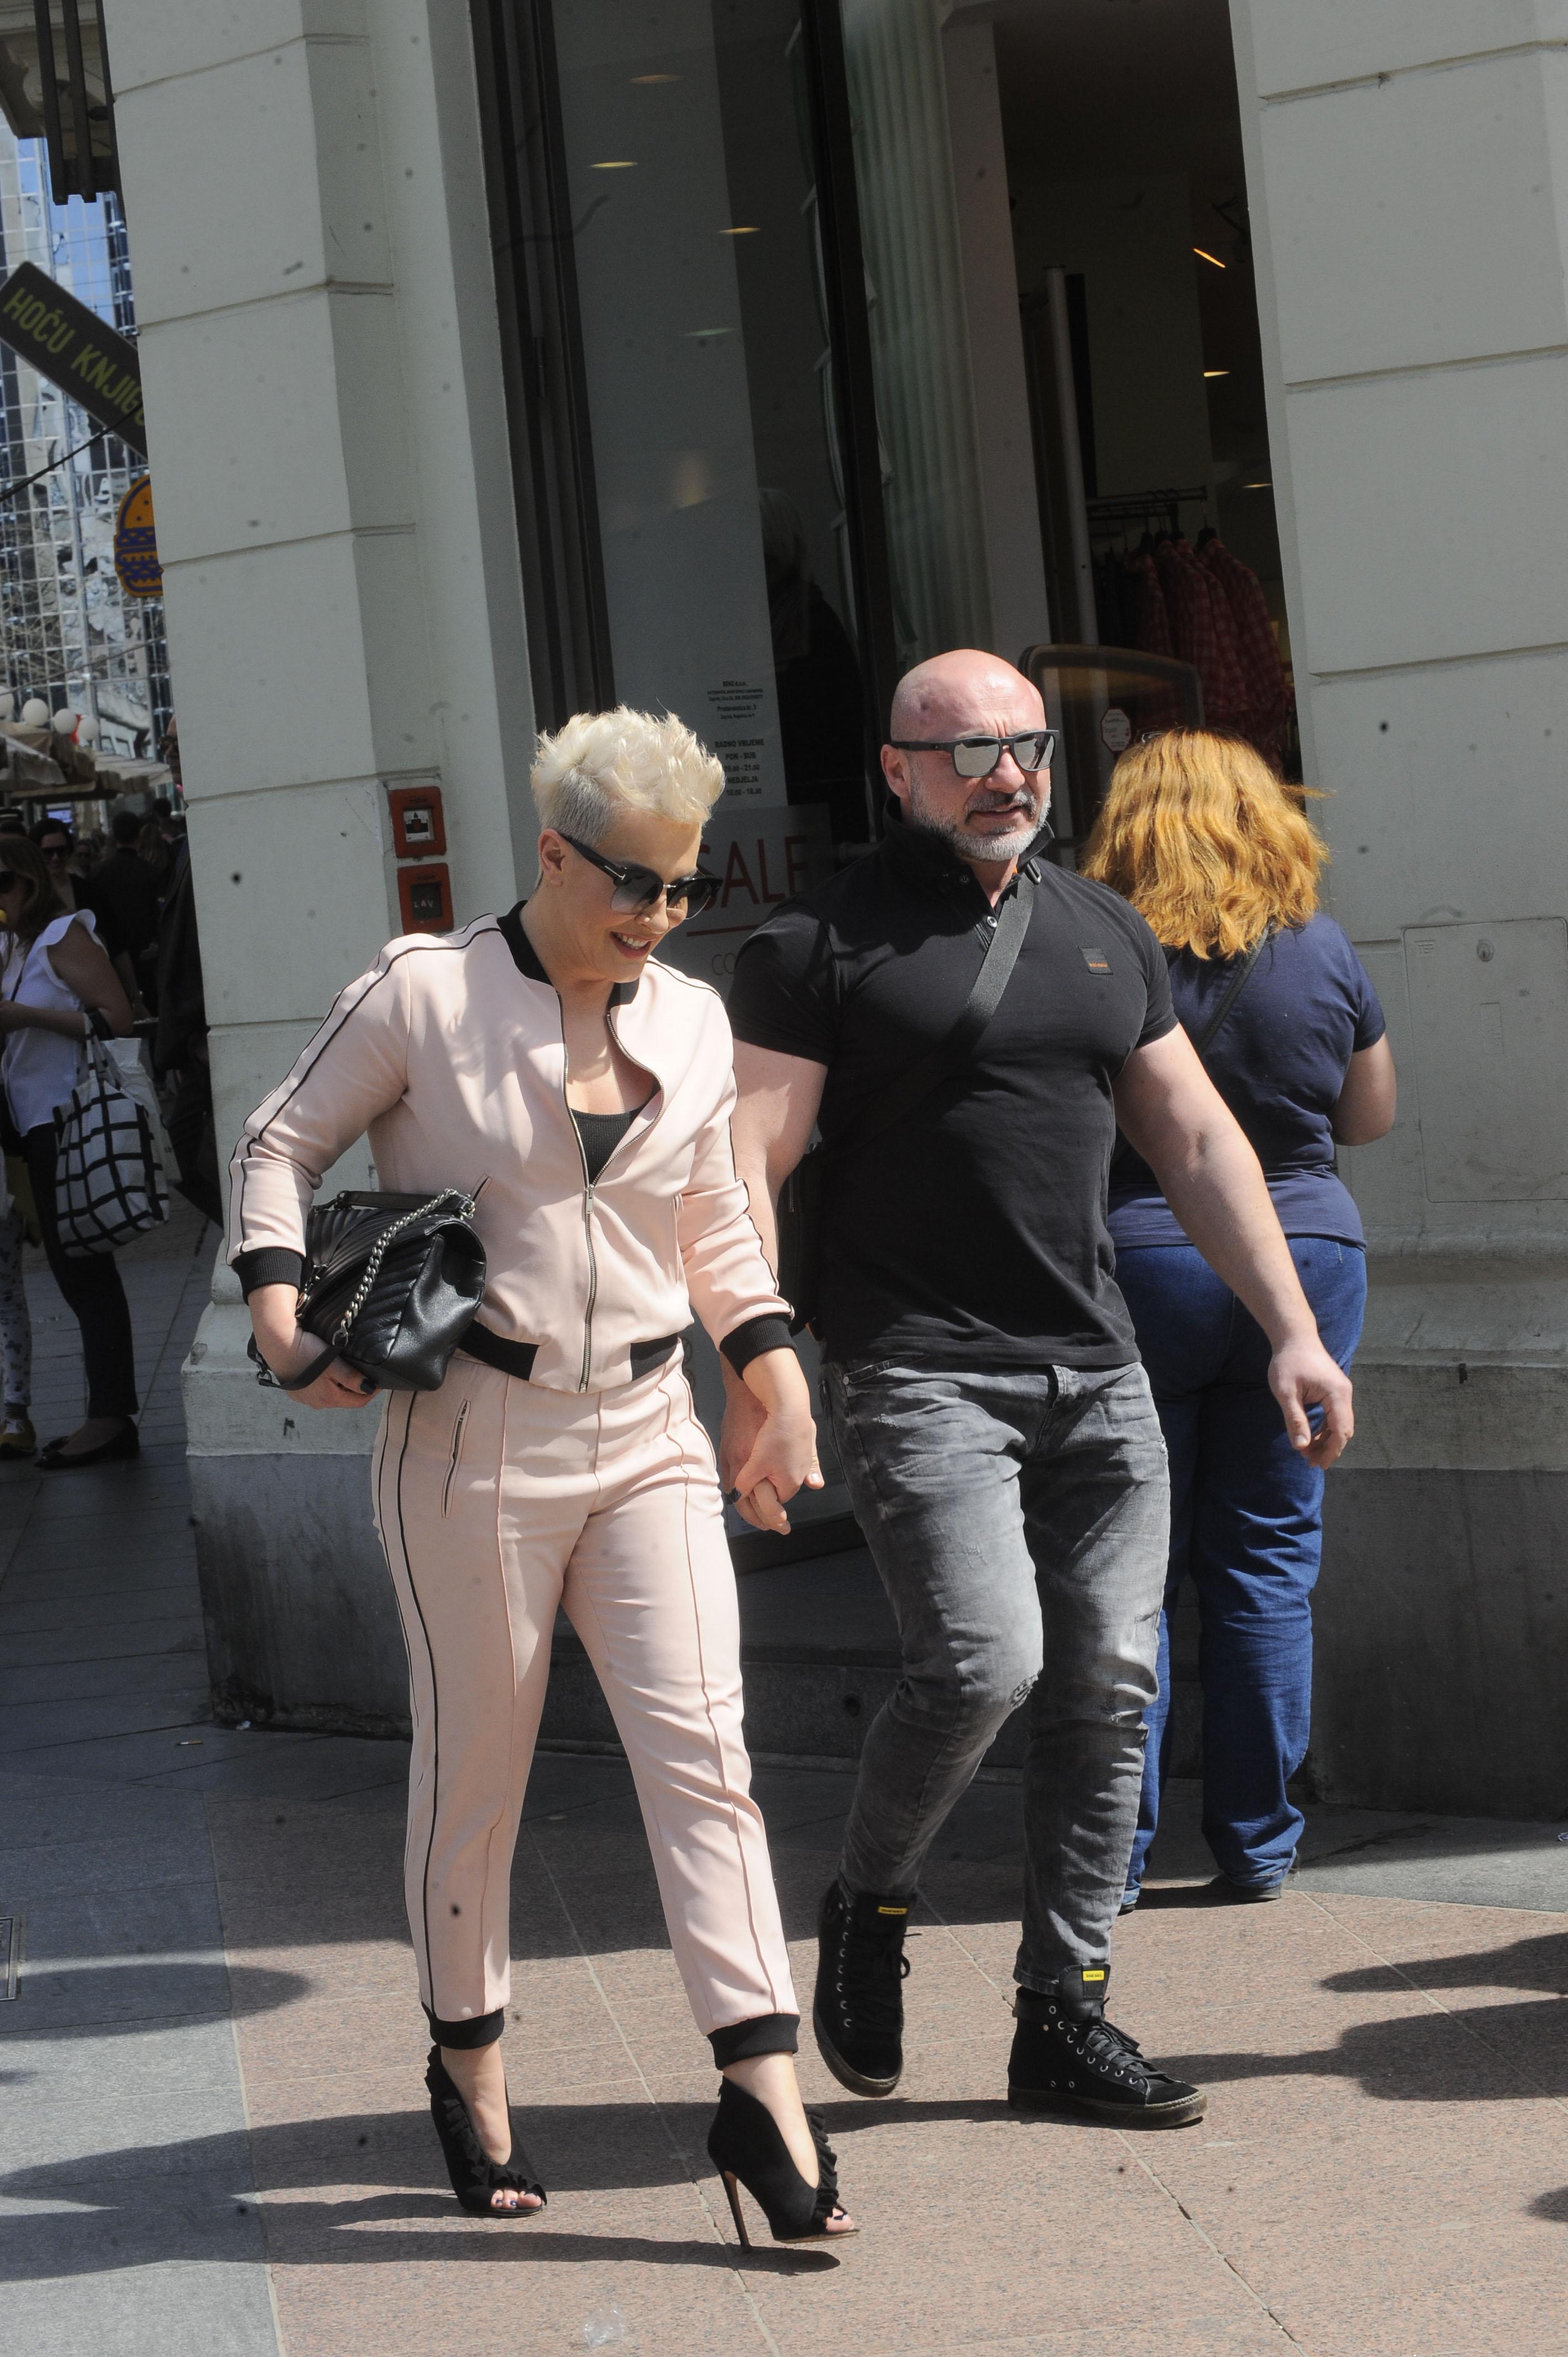 Spica / Zagreb 14.04.2018. / foto. Davor Matota / Indira Levak ex Vladic i suprug Miroslav Levak